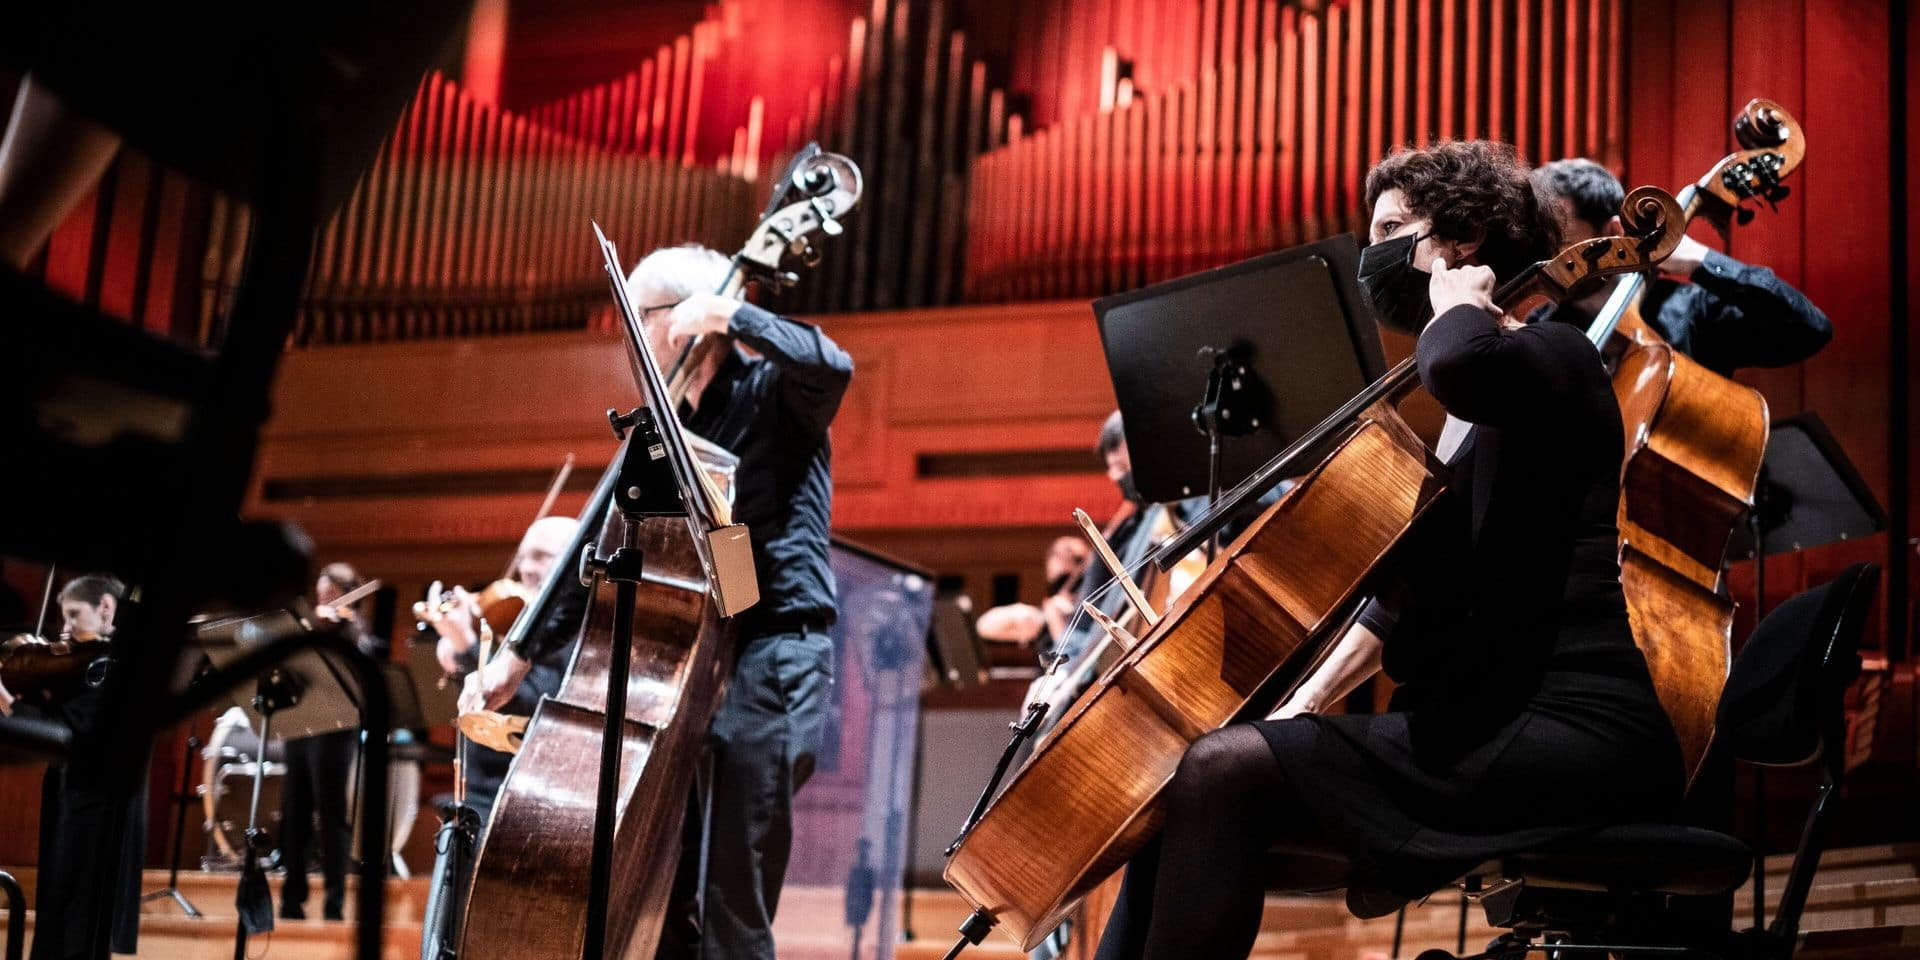 Le Brussels Philharmonic lance sa propre application